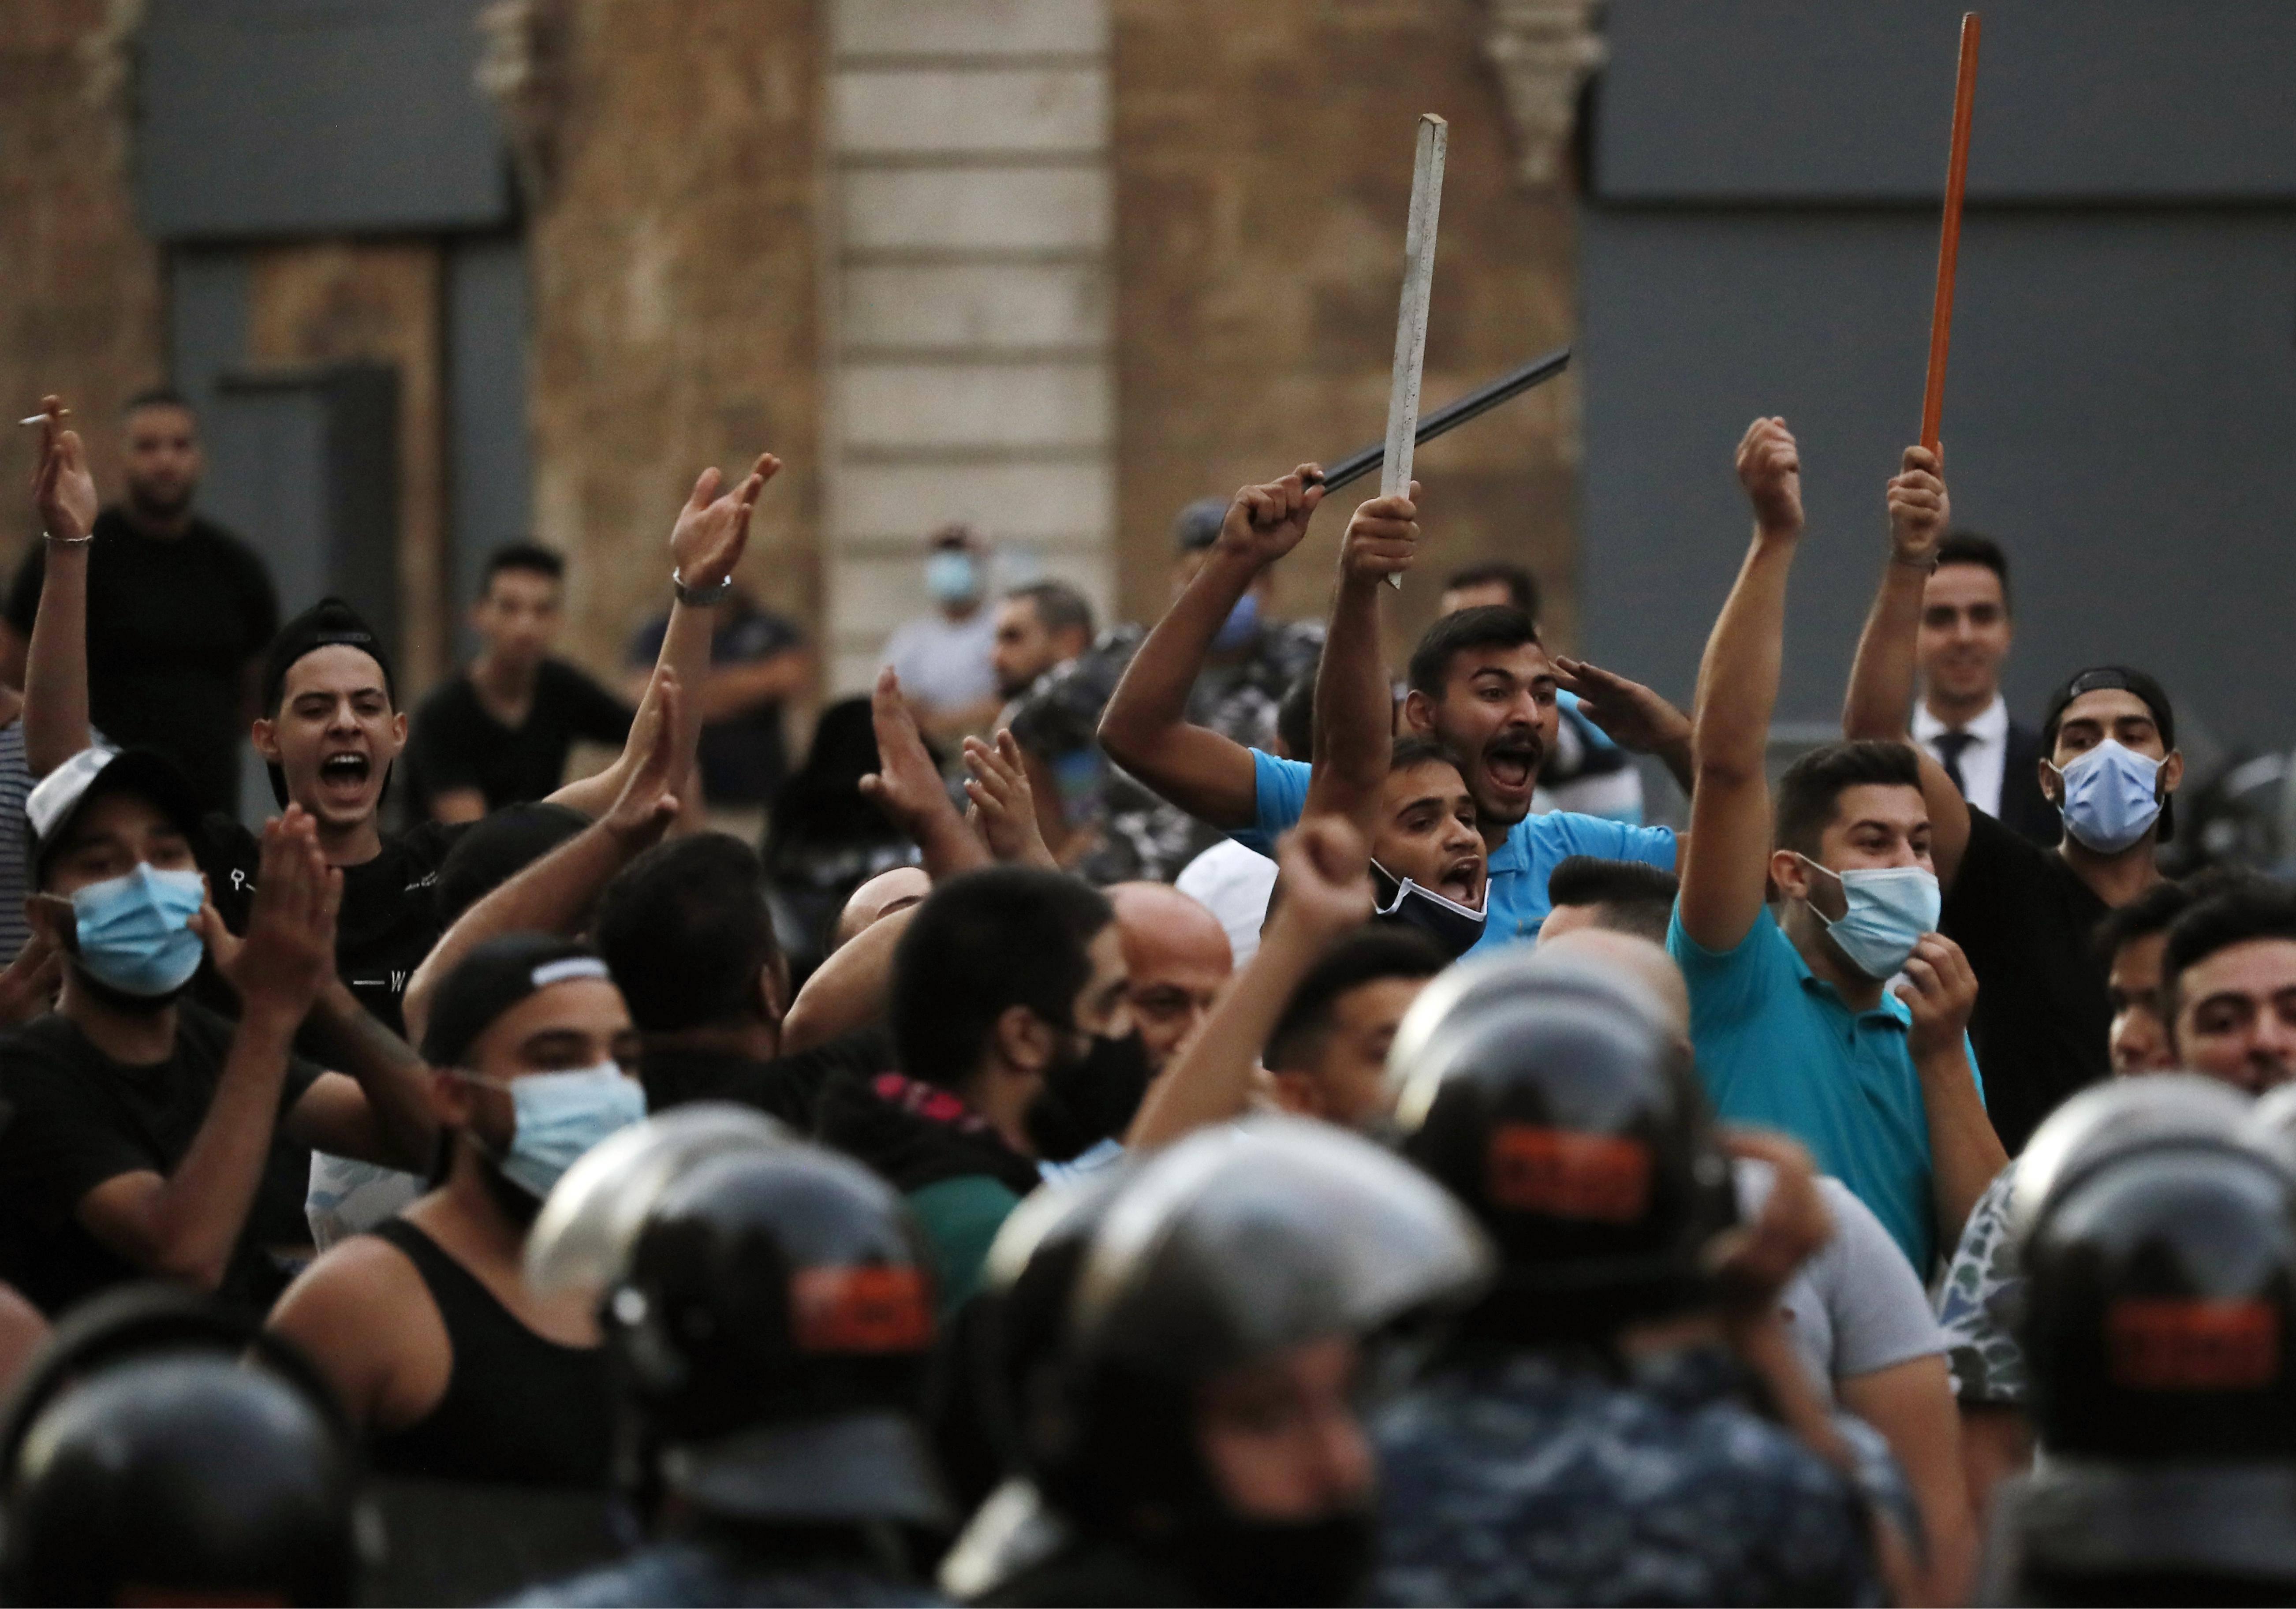 Lebanon's Hariri to return to head cabinet with slim support